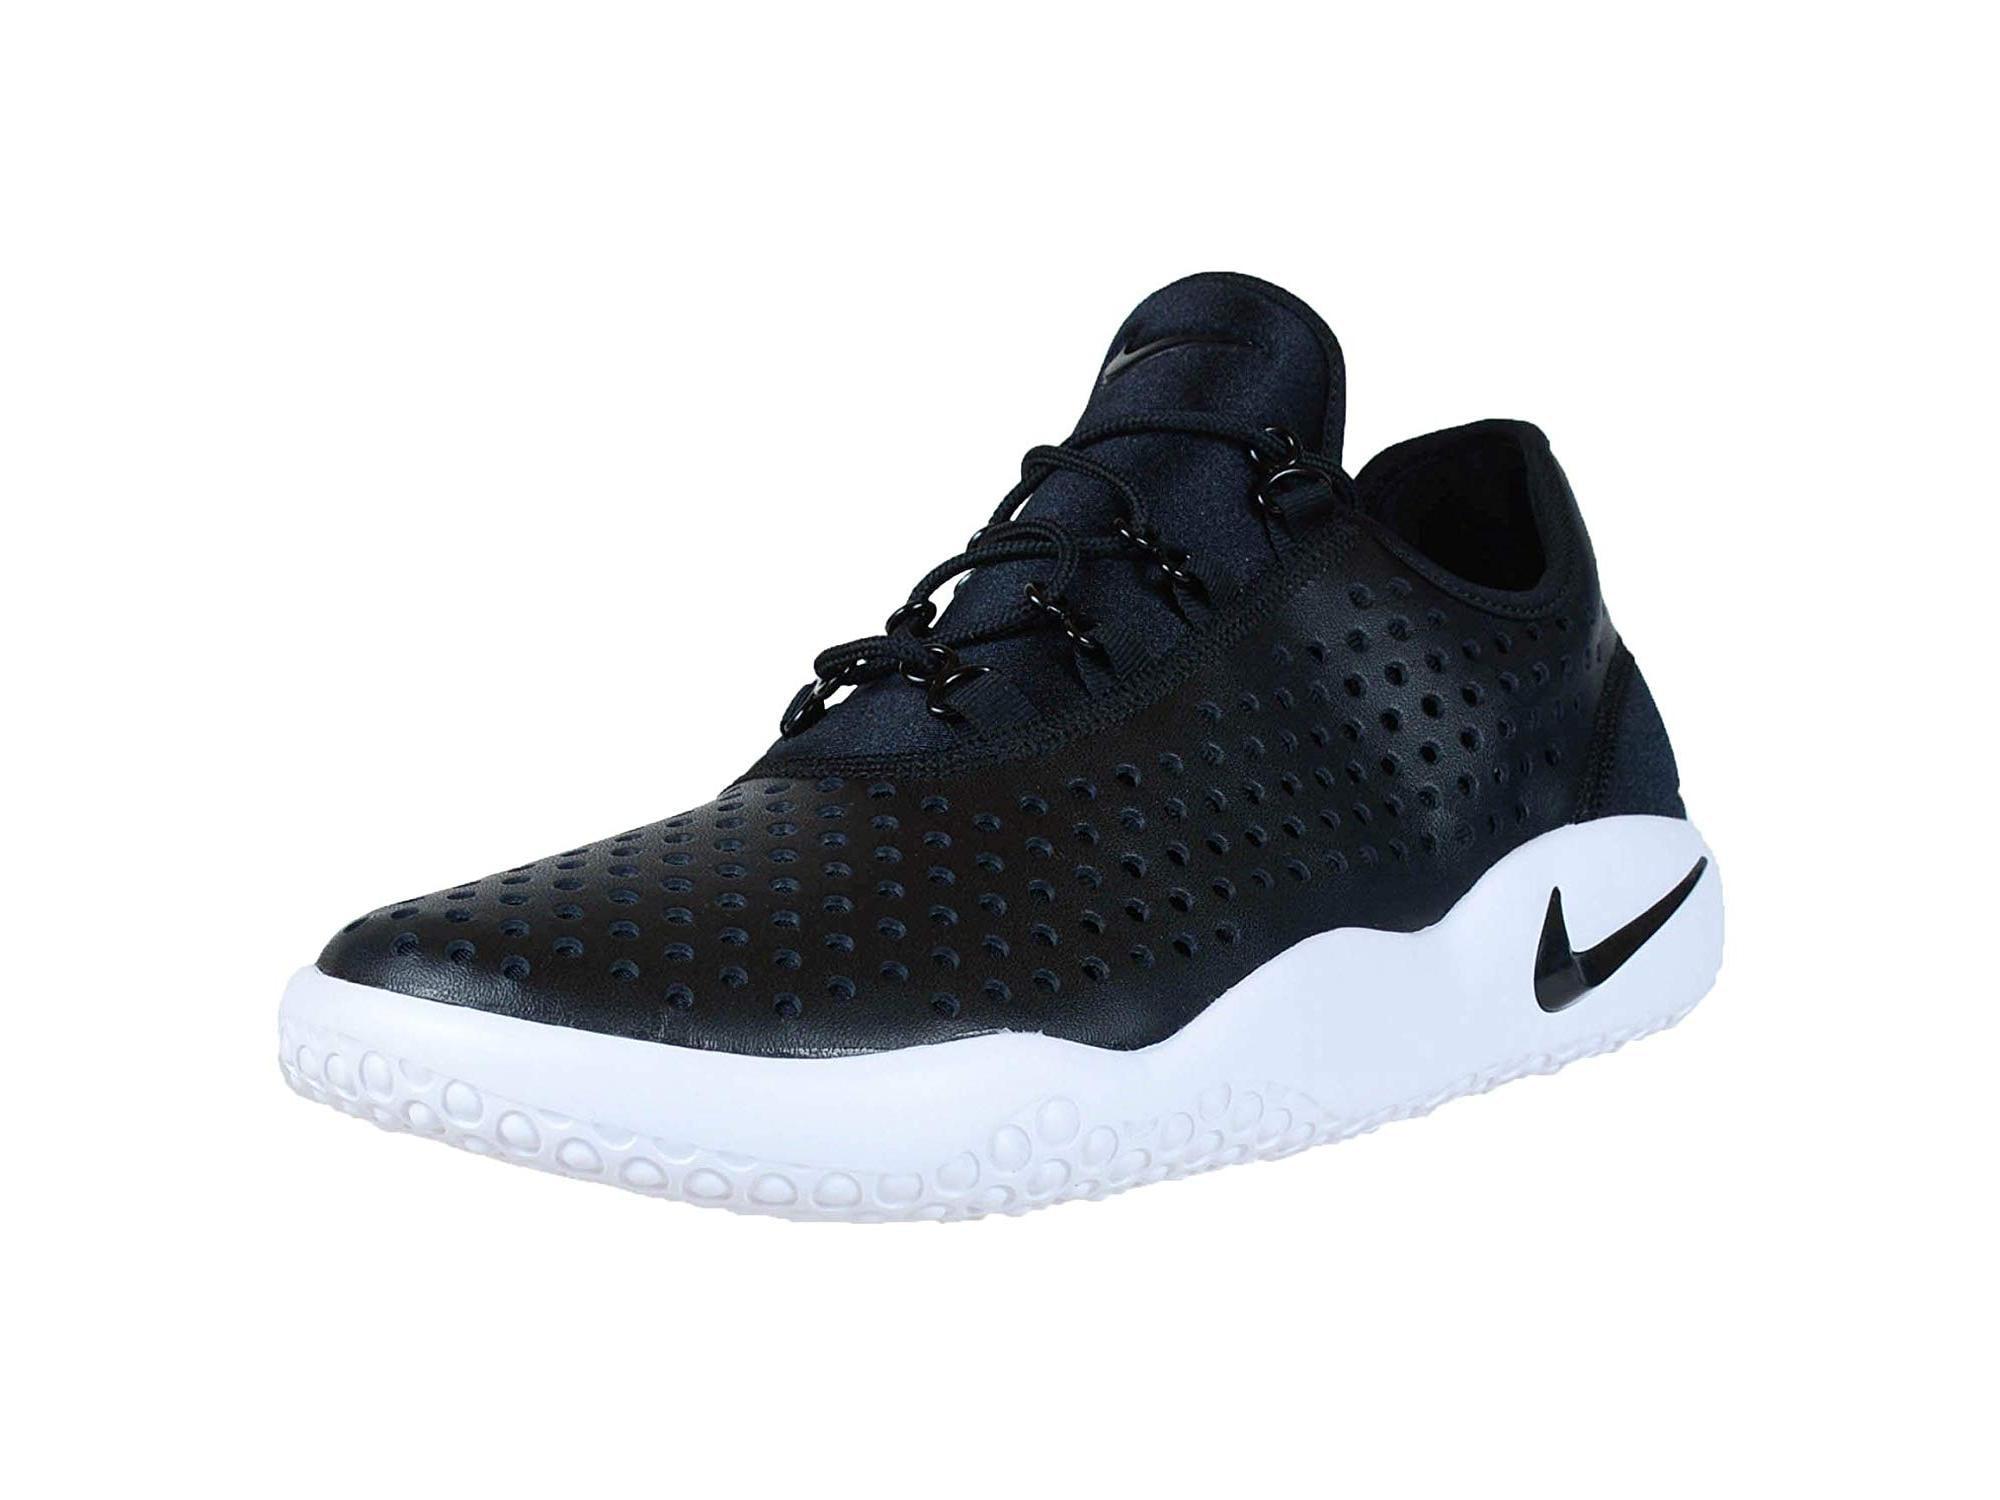 NIKE FL-RUE Mens Running Trainers 880994 Sneakers 43186c43aa